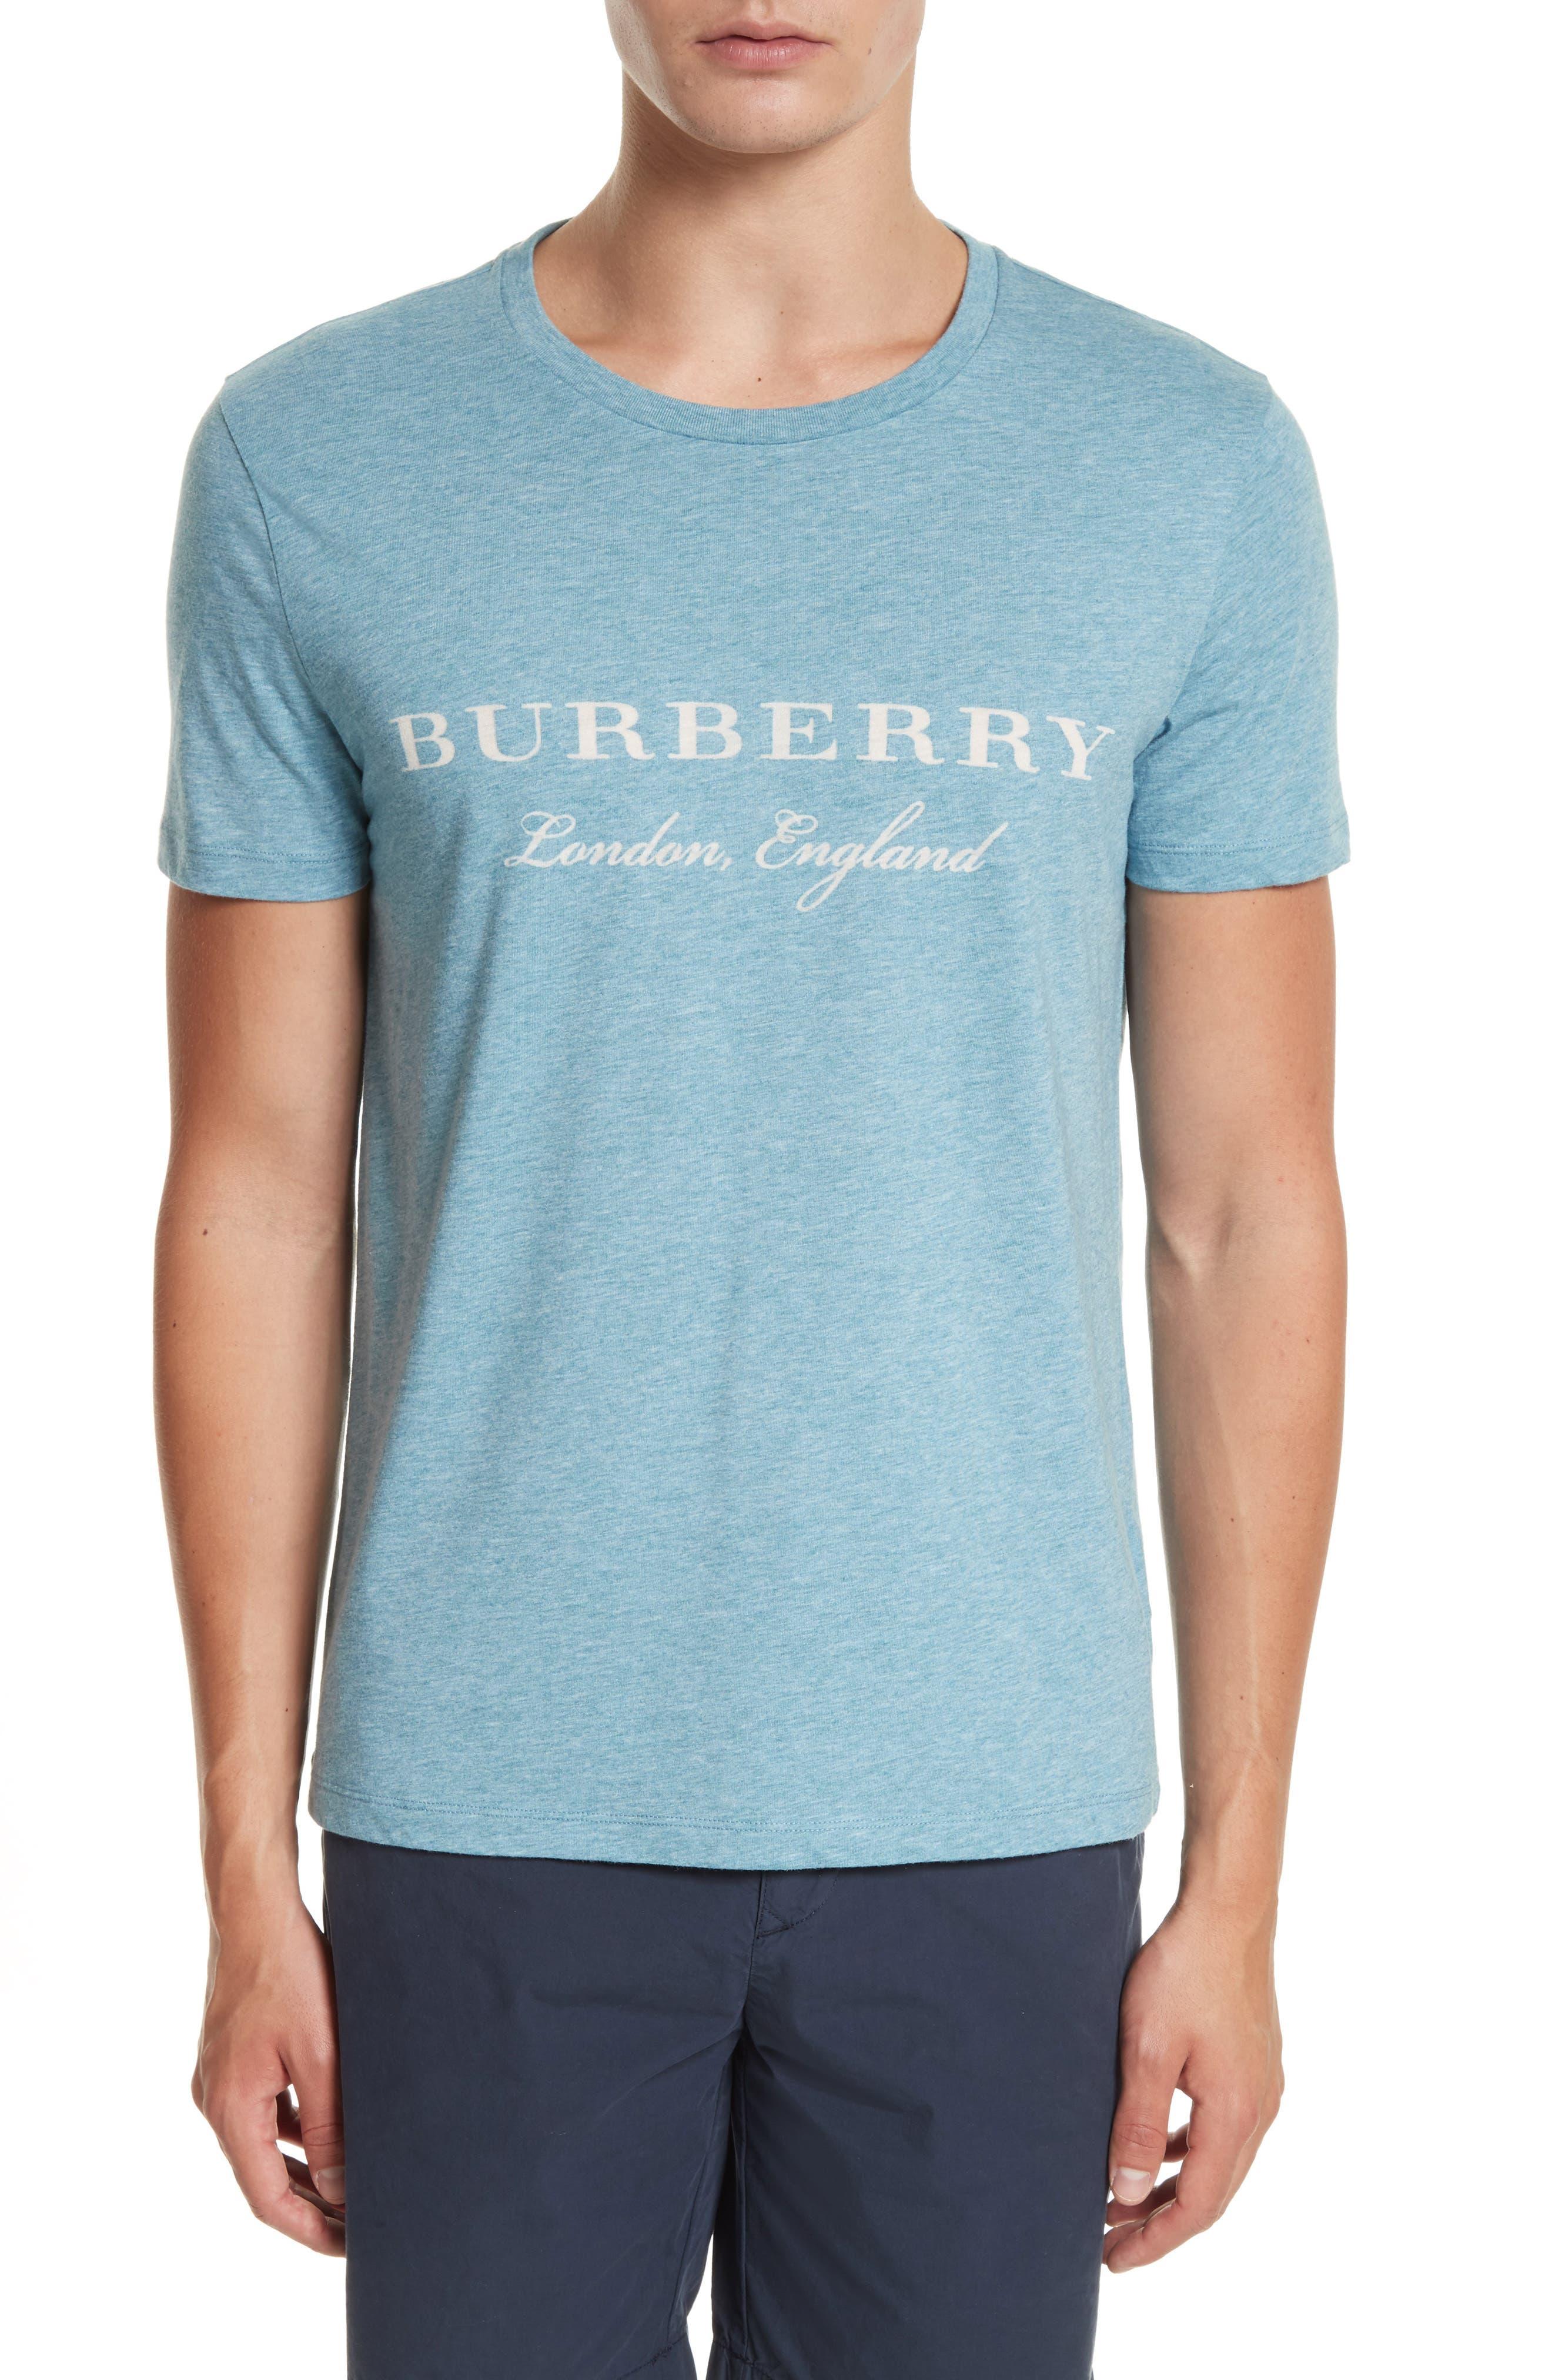 Burberry Martford Crewneck T-Shirt